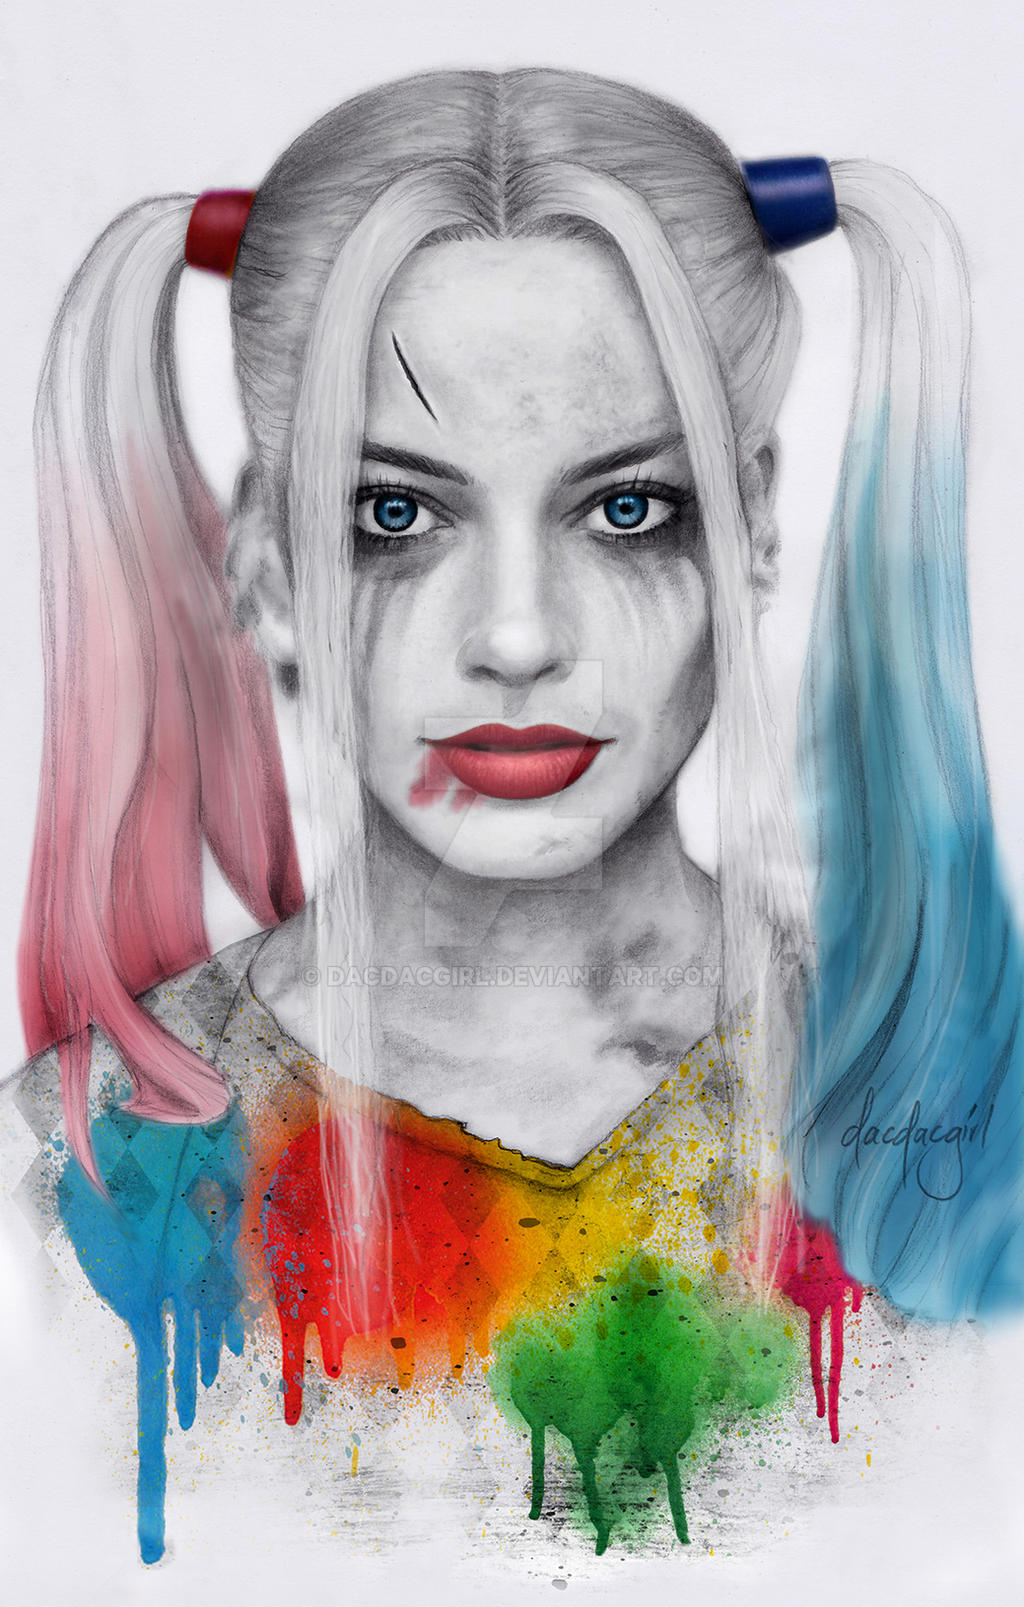 Harley Quinn pencil portrait by Dacdacgirl